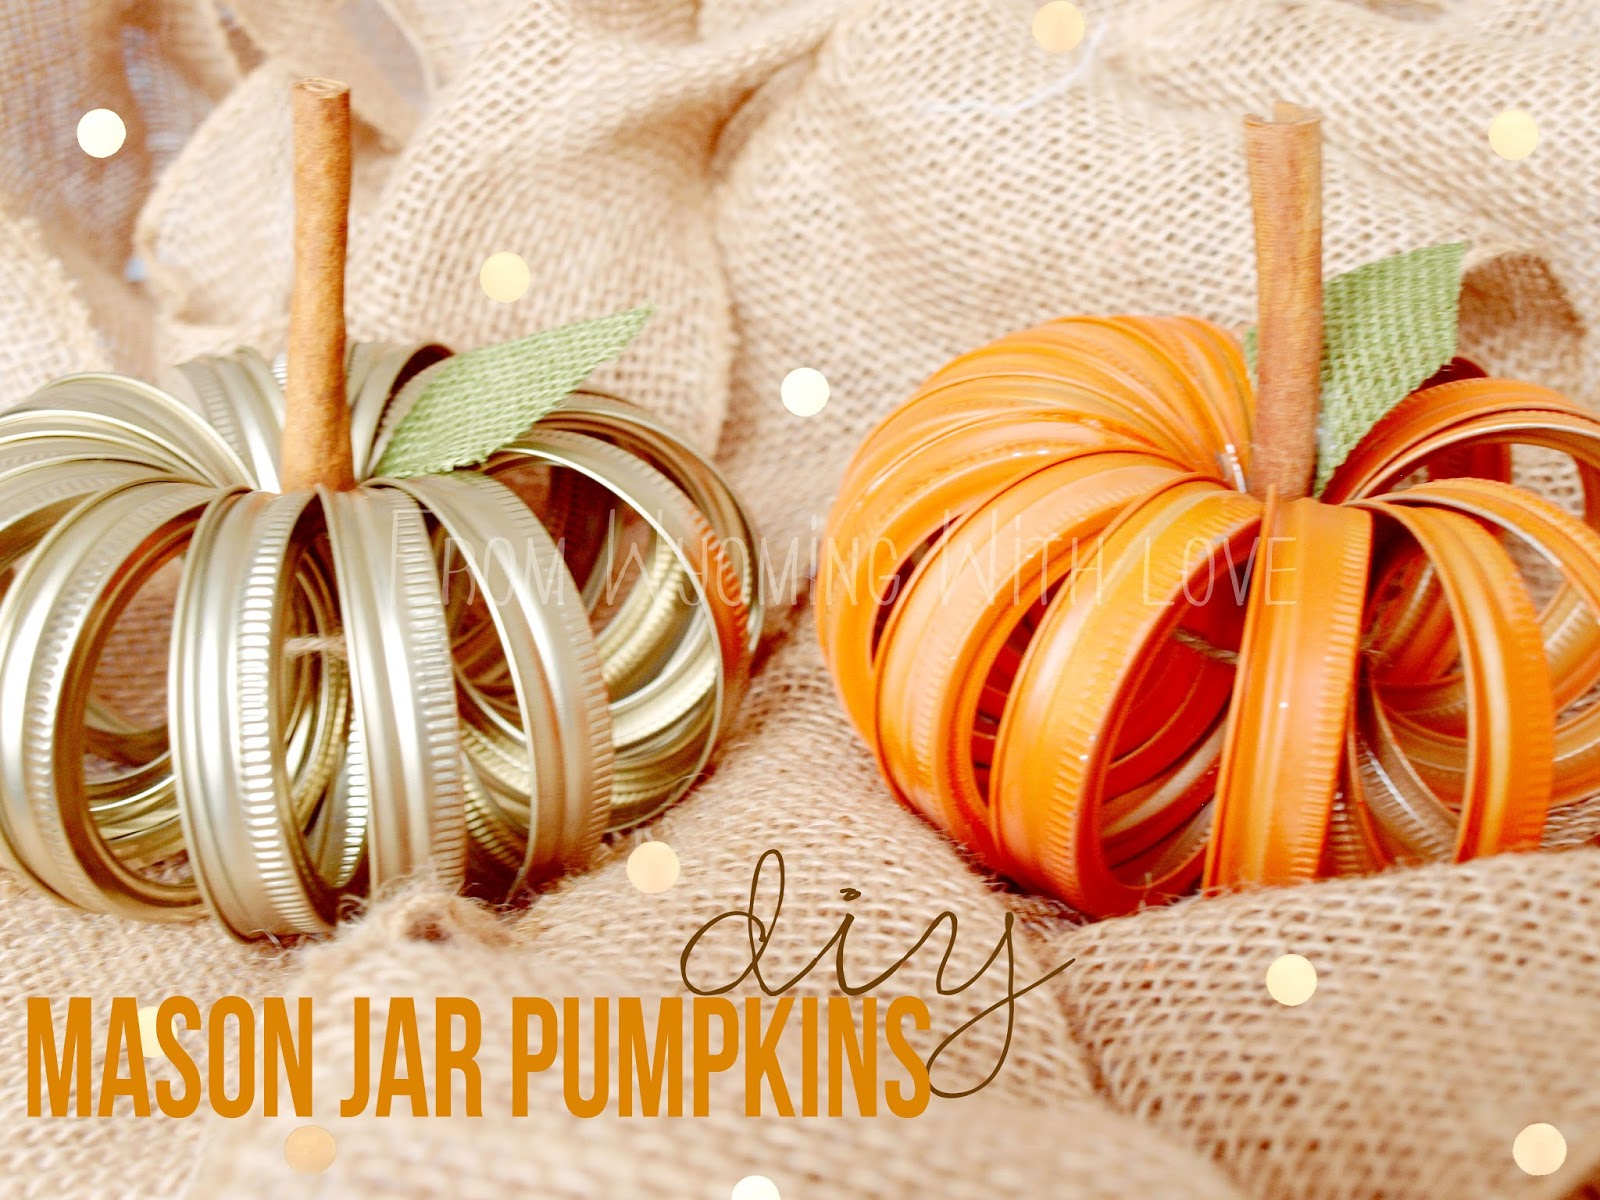 Diy Mason Jar Lid Pumpkin